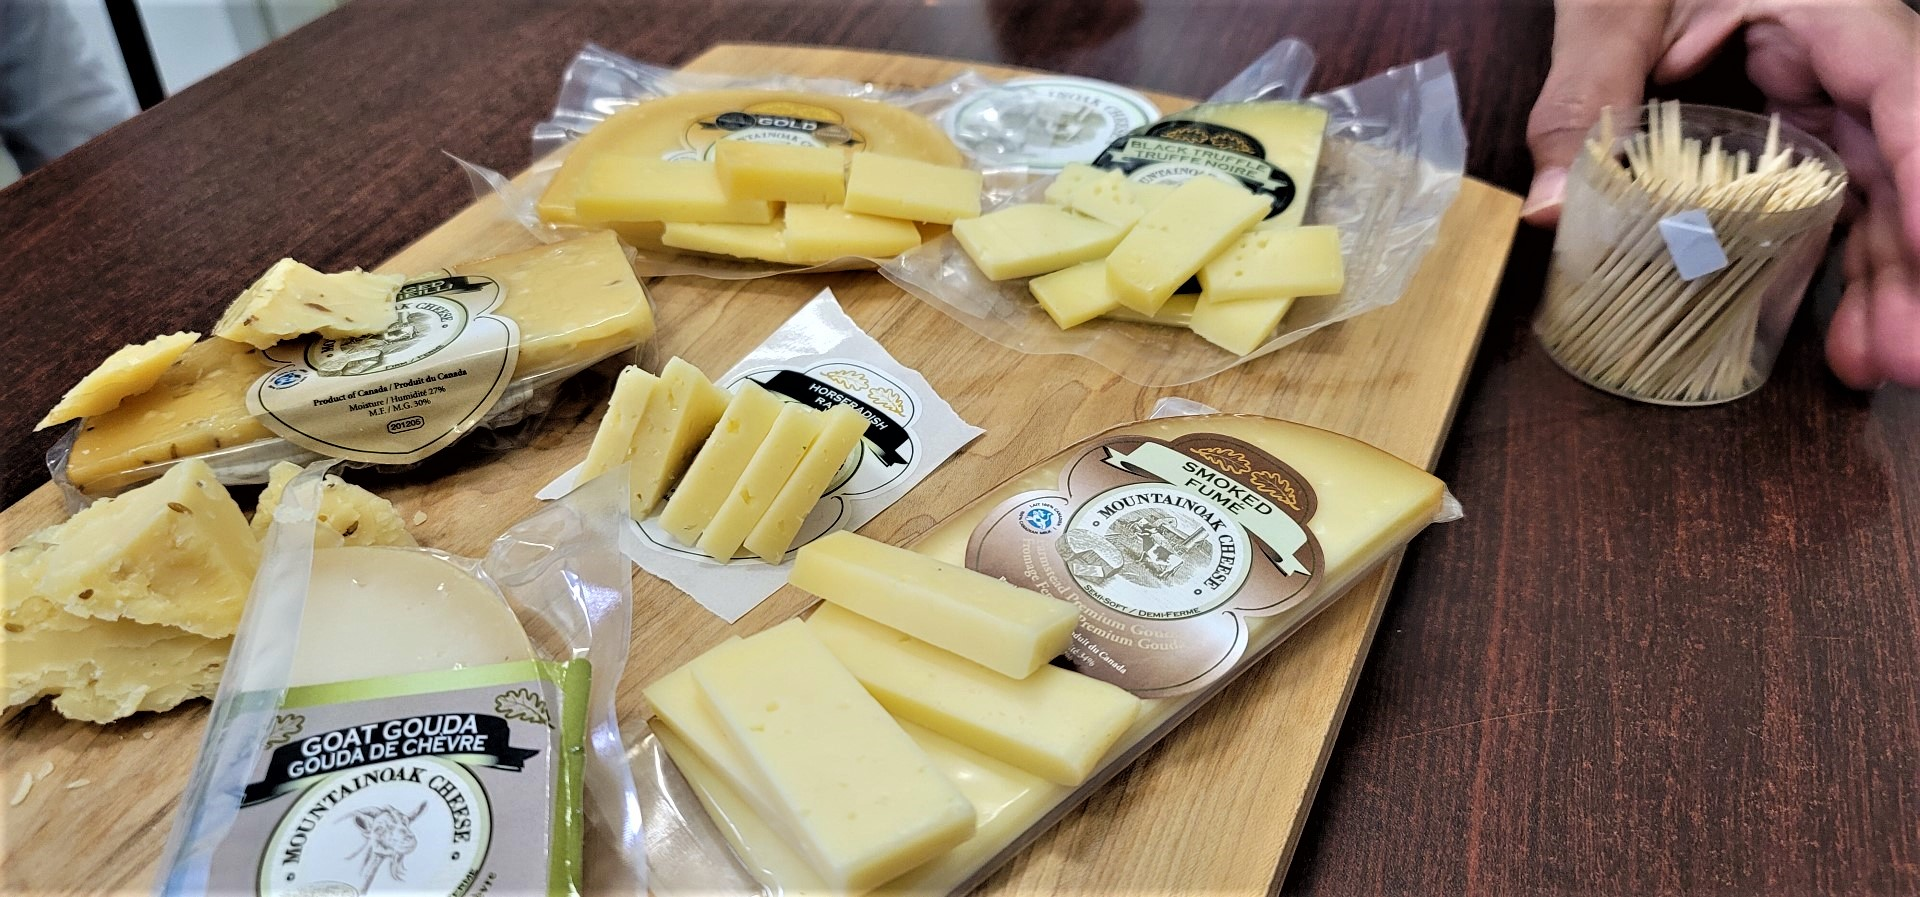 Mountain oak Cheese samples